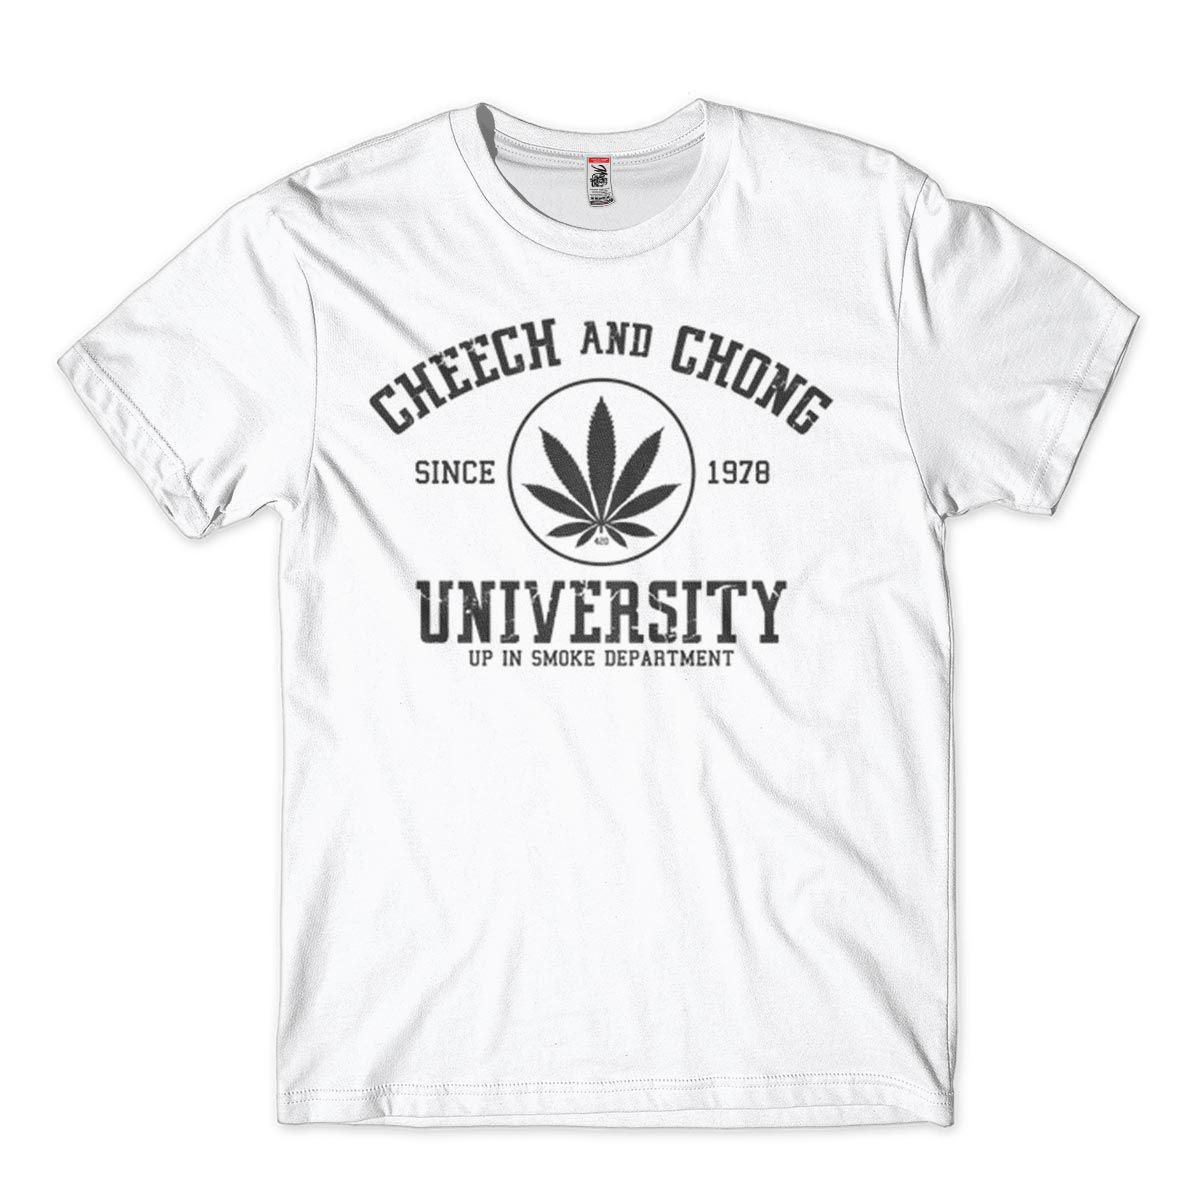 Camiseta Cheech And Chong Masculina tamanho G Branca